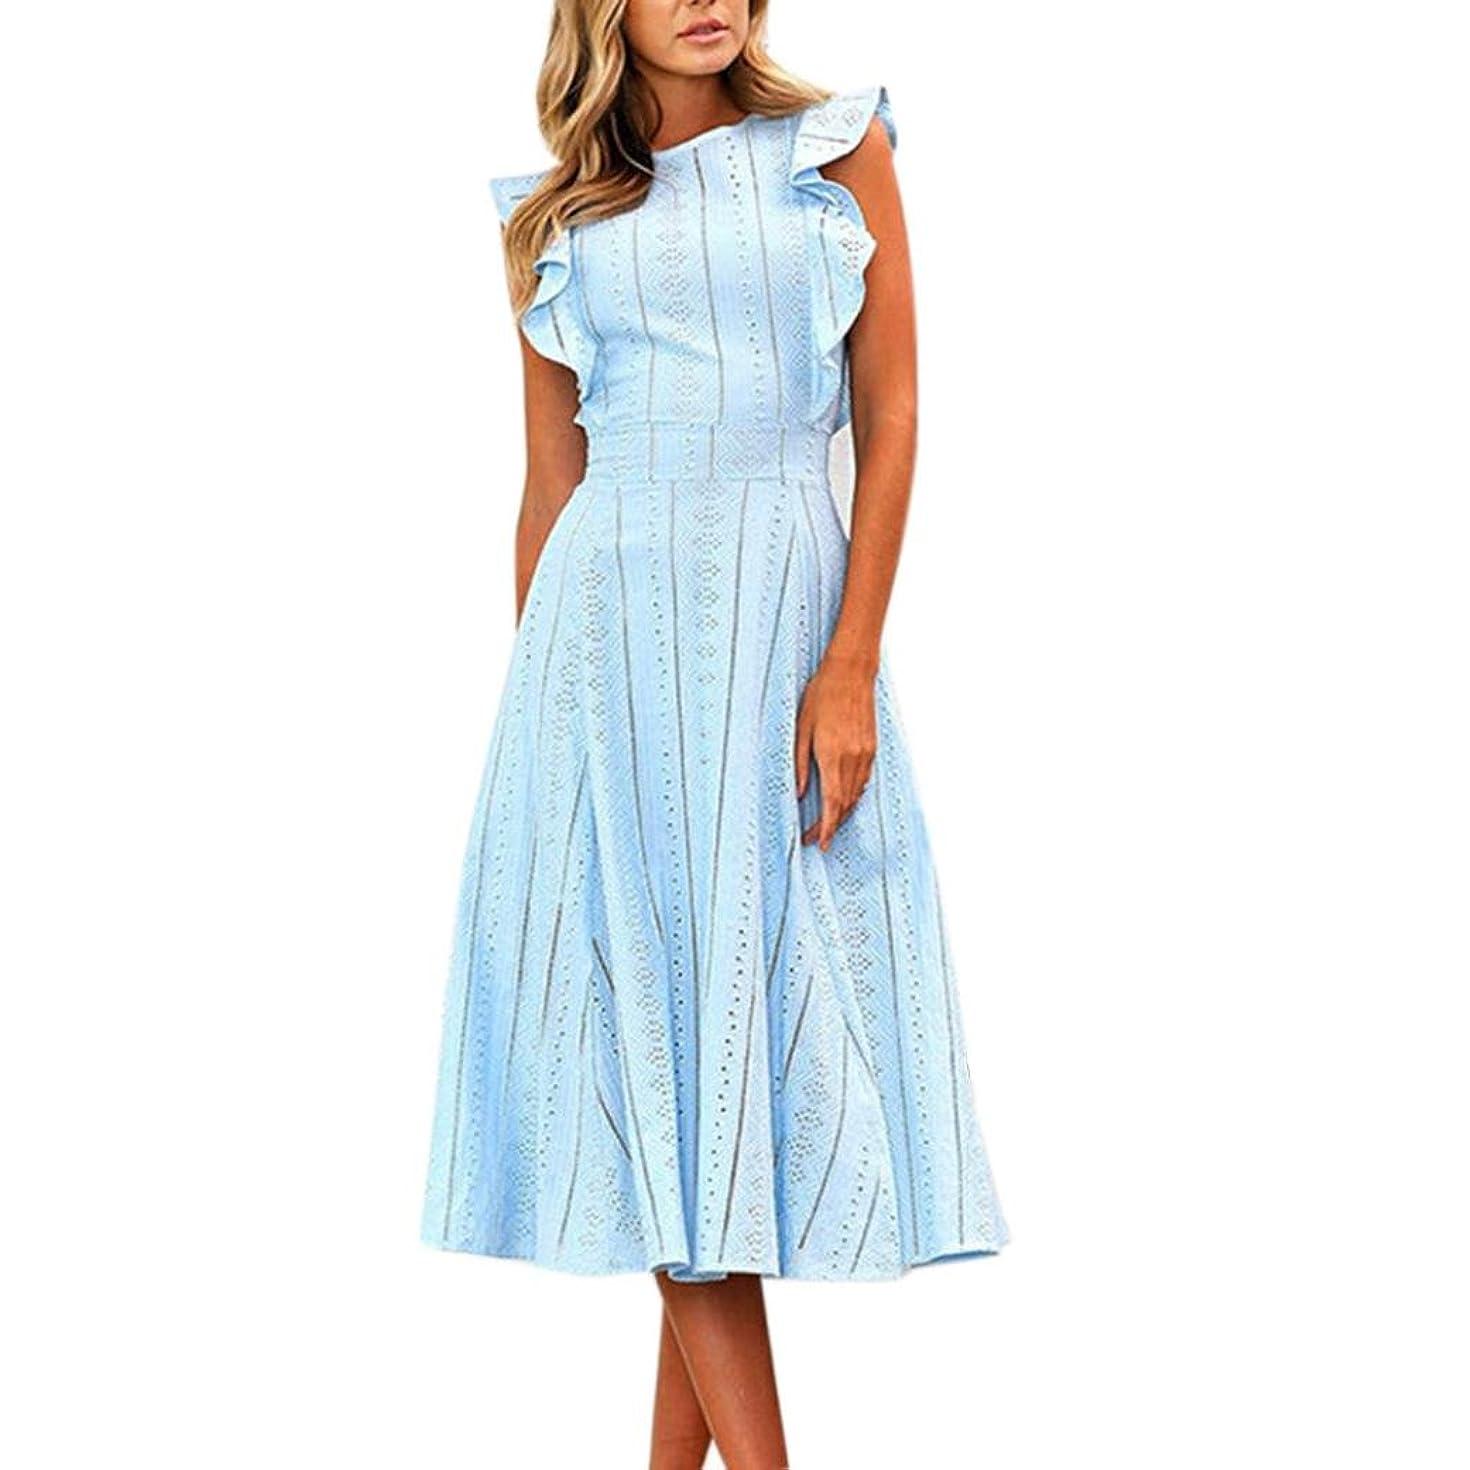 Graduation Ceremony Dress,Women Captains Party Formal Lace Sundress Office Sleeveless Tunic Midi Dress Hemlock (M, Blue)